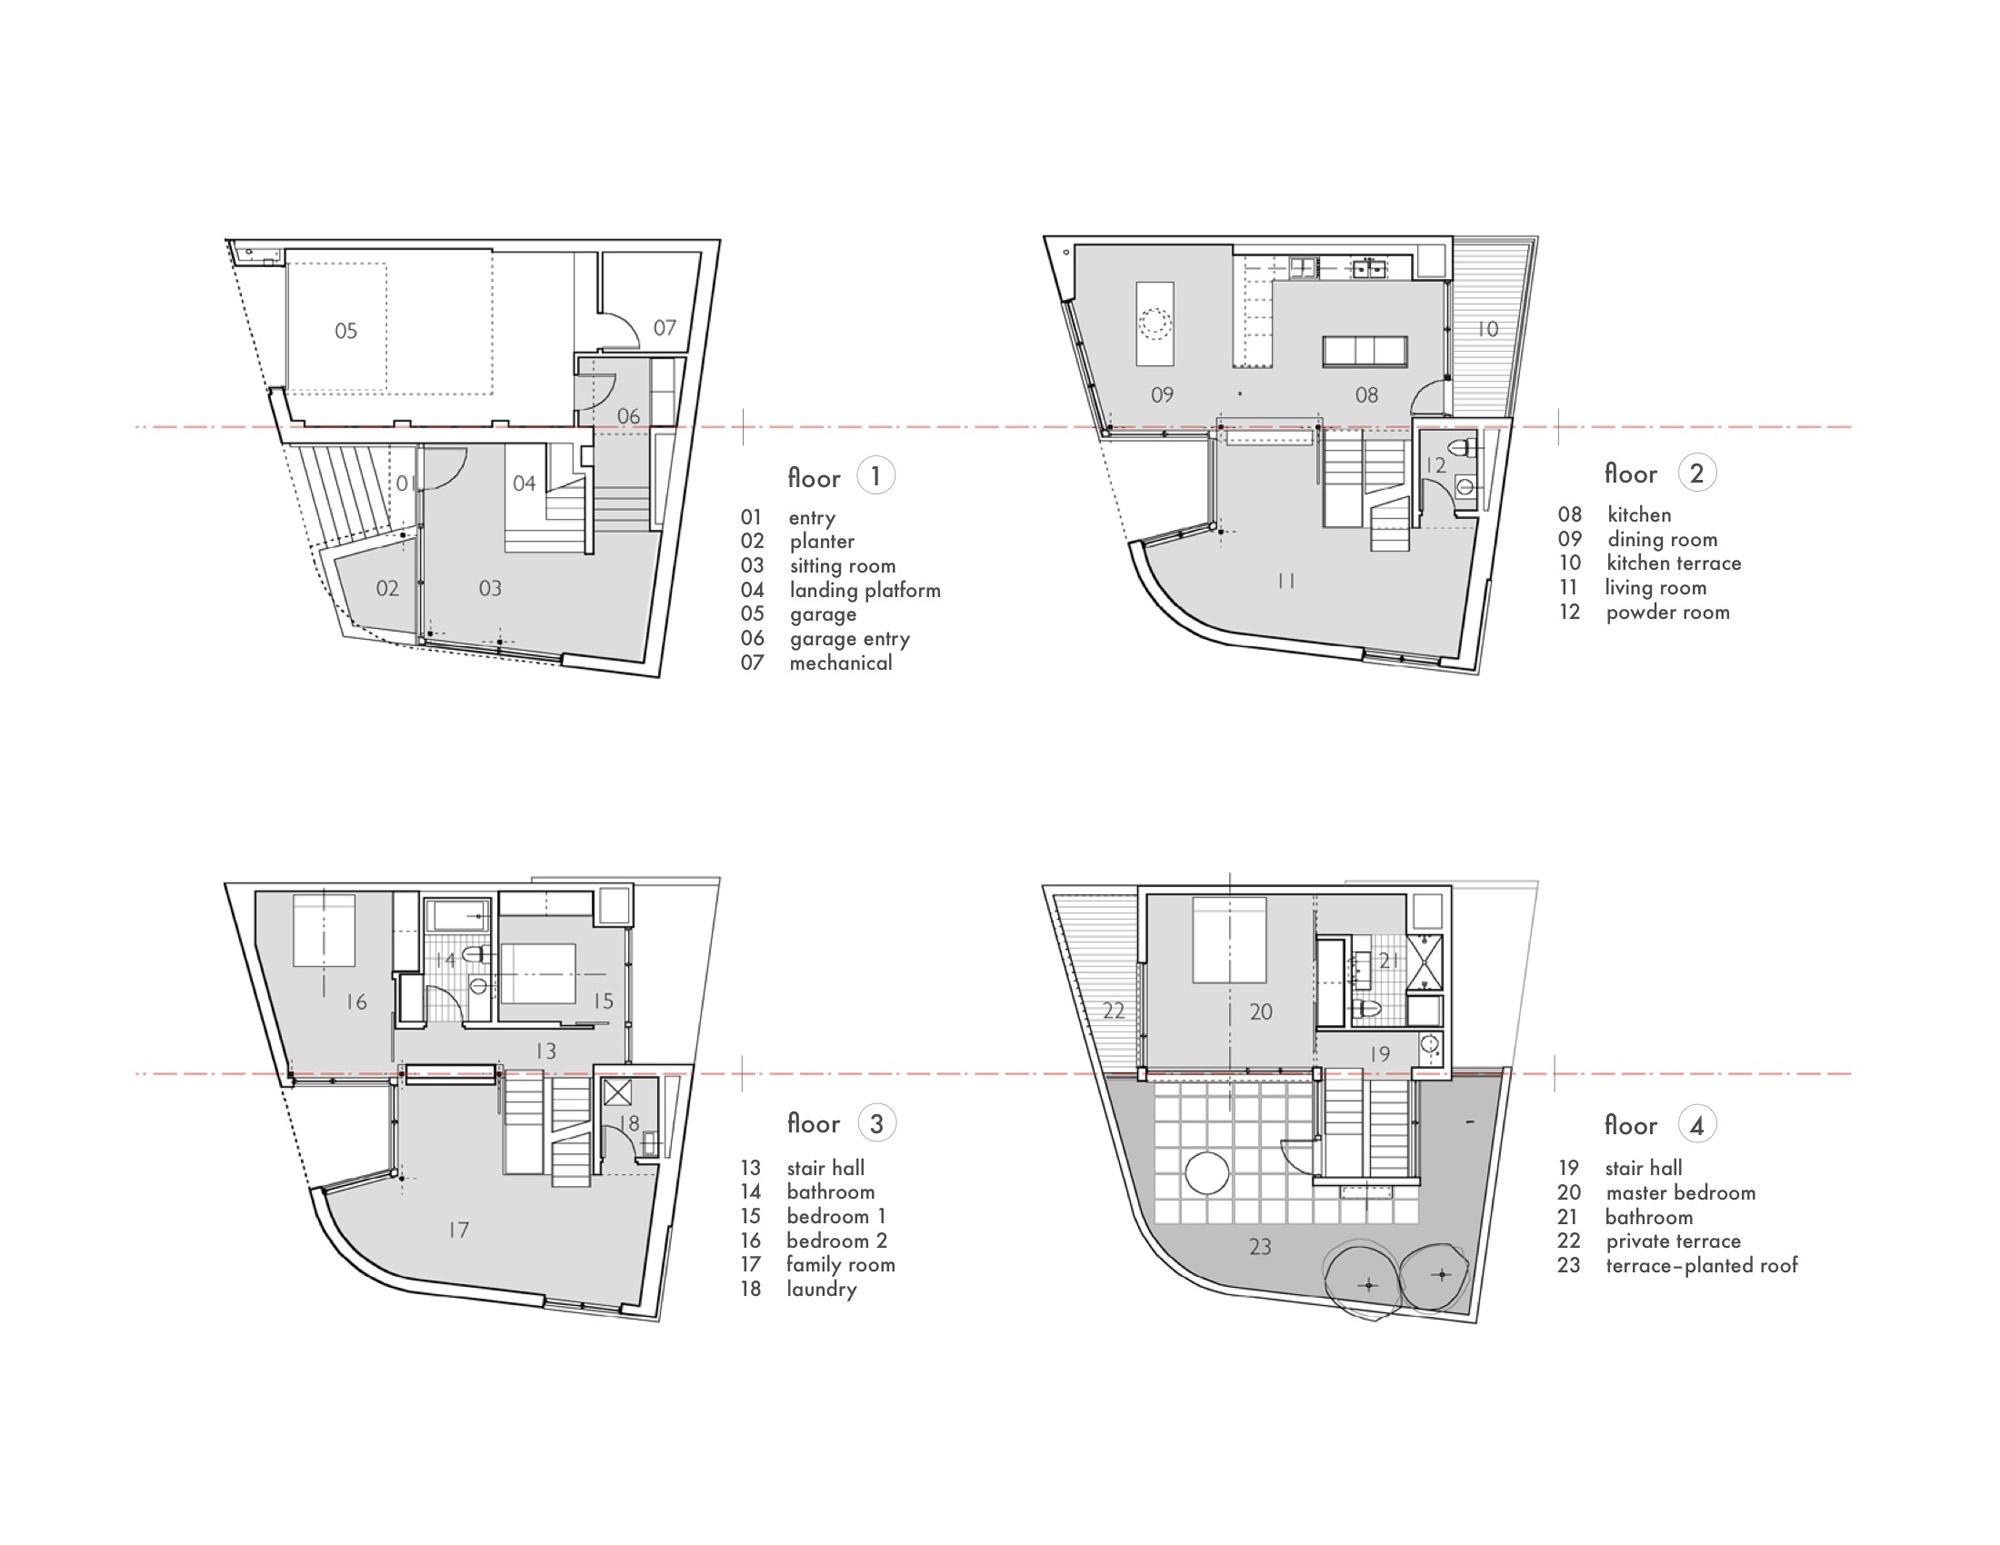 gallery of split level house qb design 20 floor plans